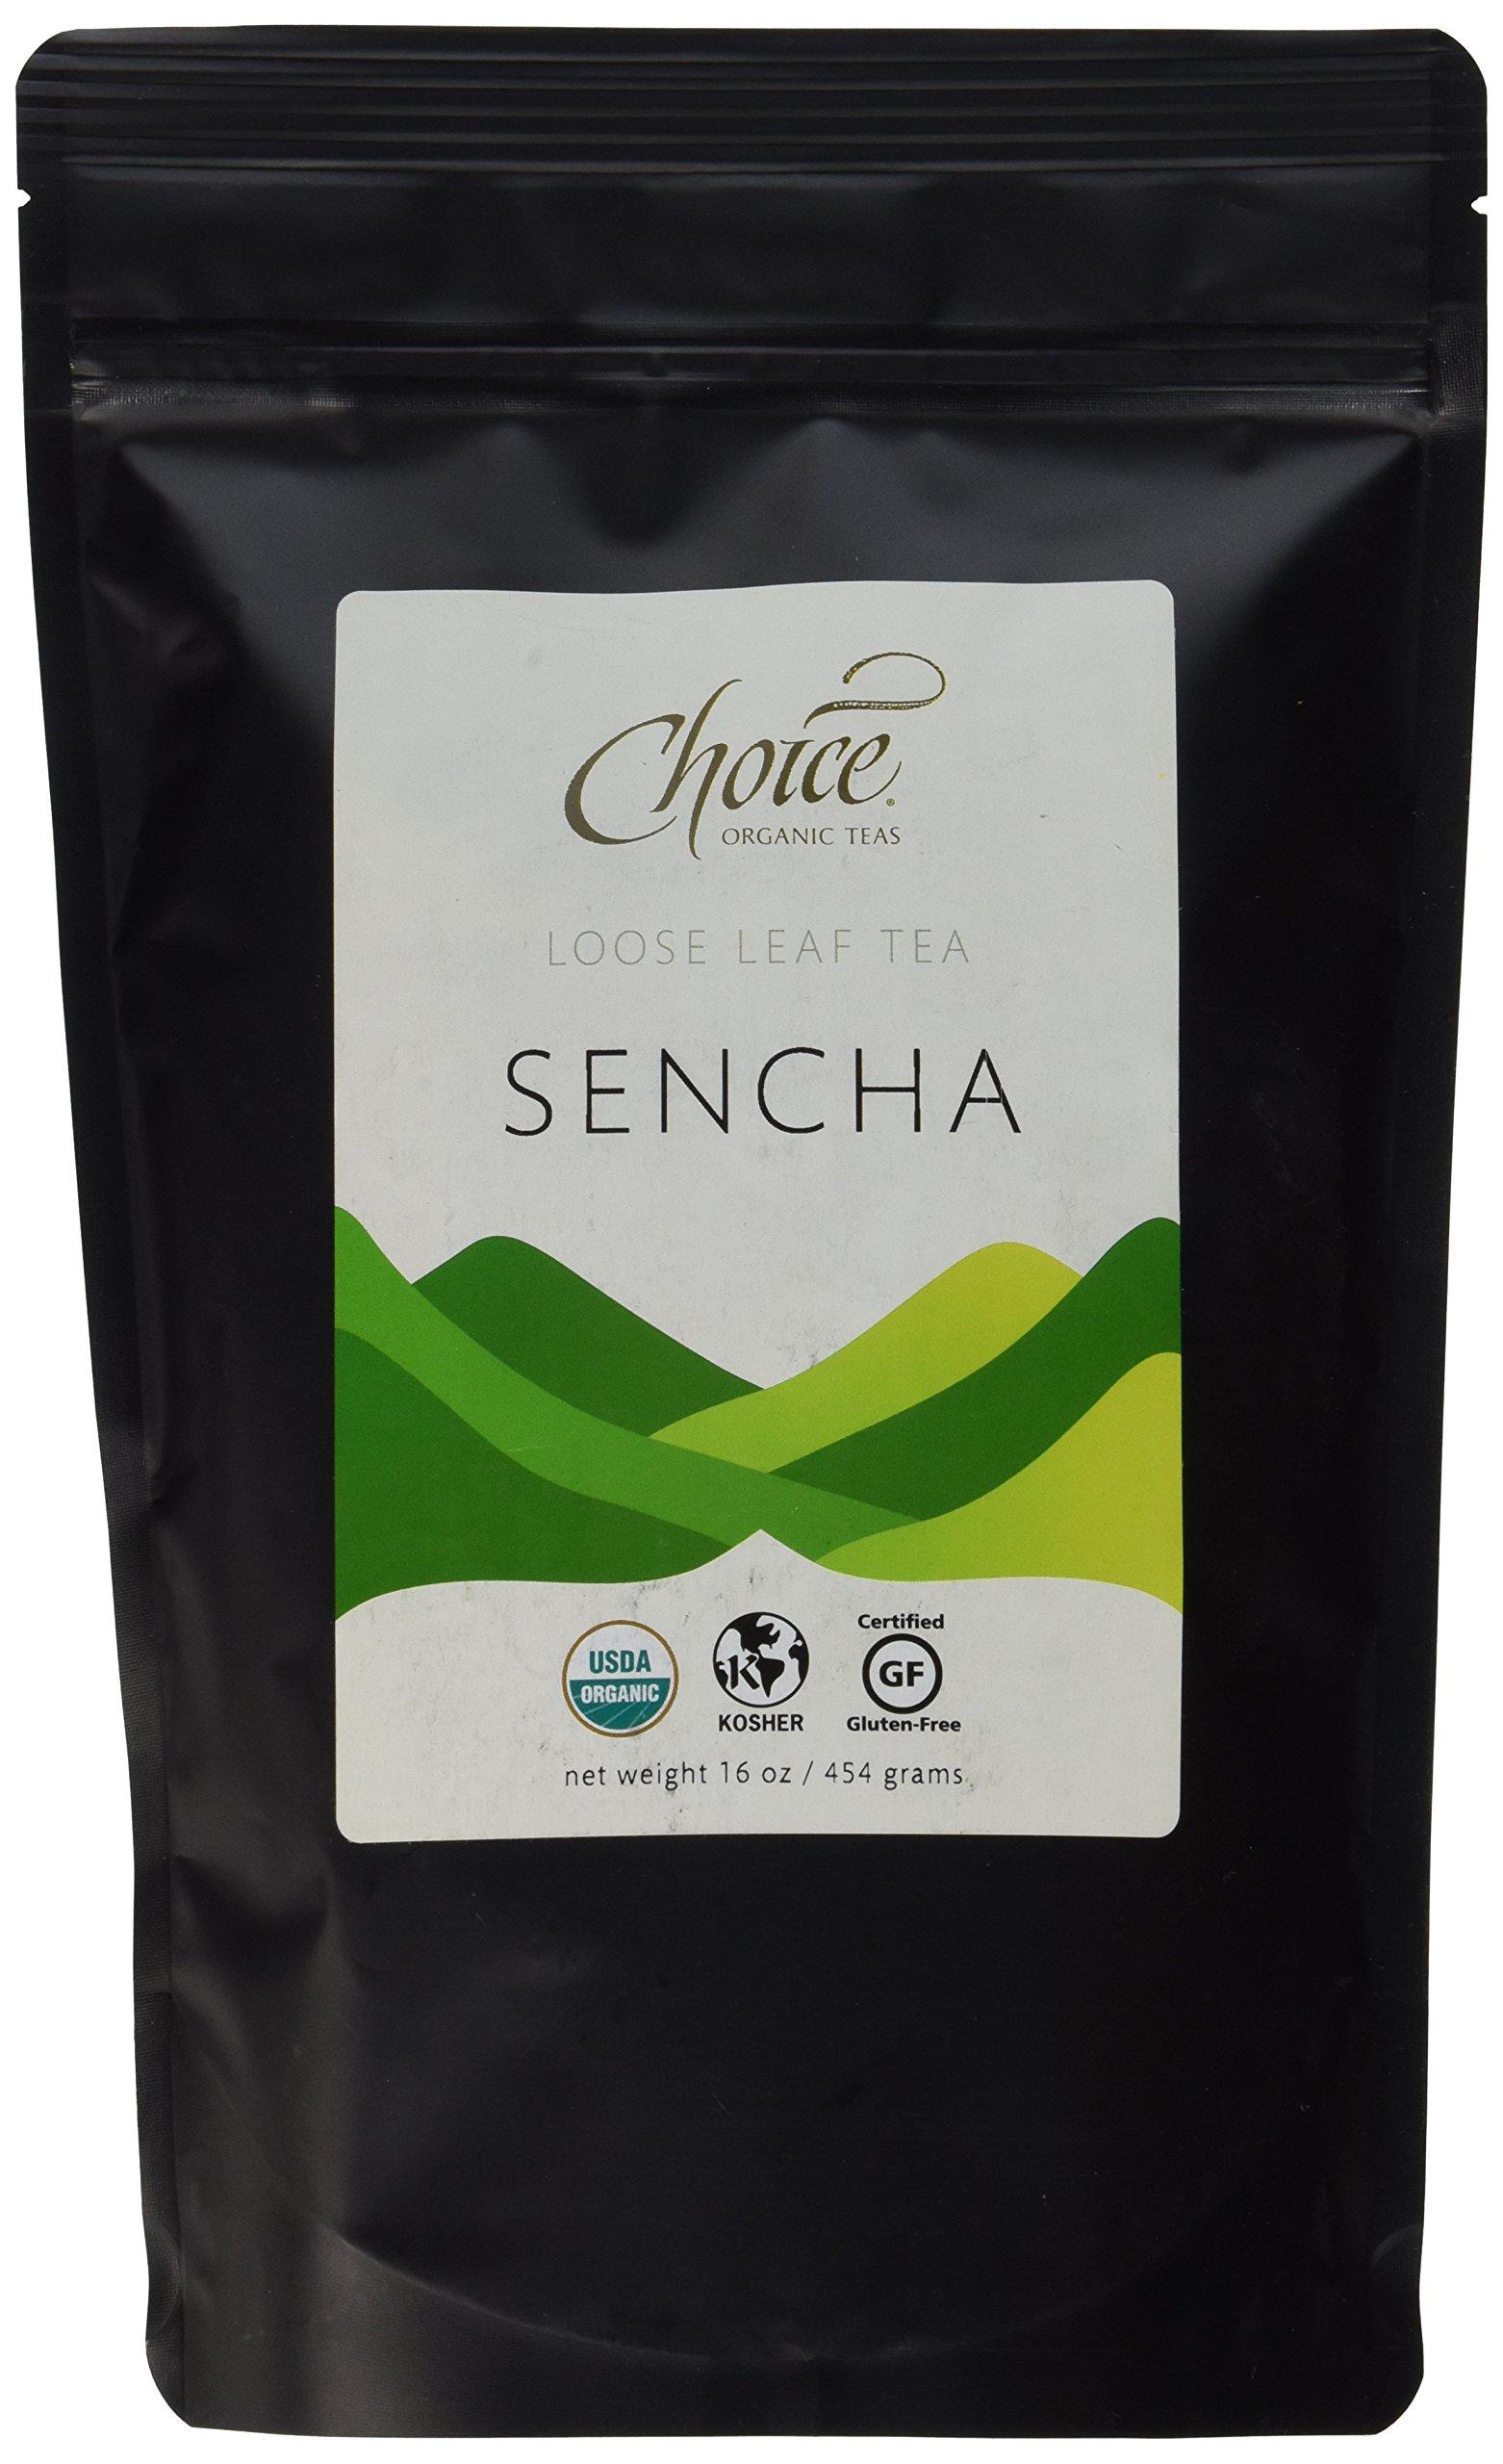 Choice Organic Teas Green Tea, Loose Leaf (1 Pound Bag), Sencha